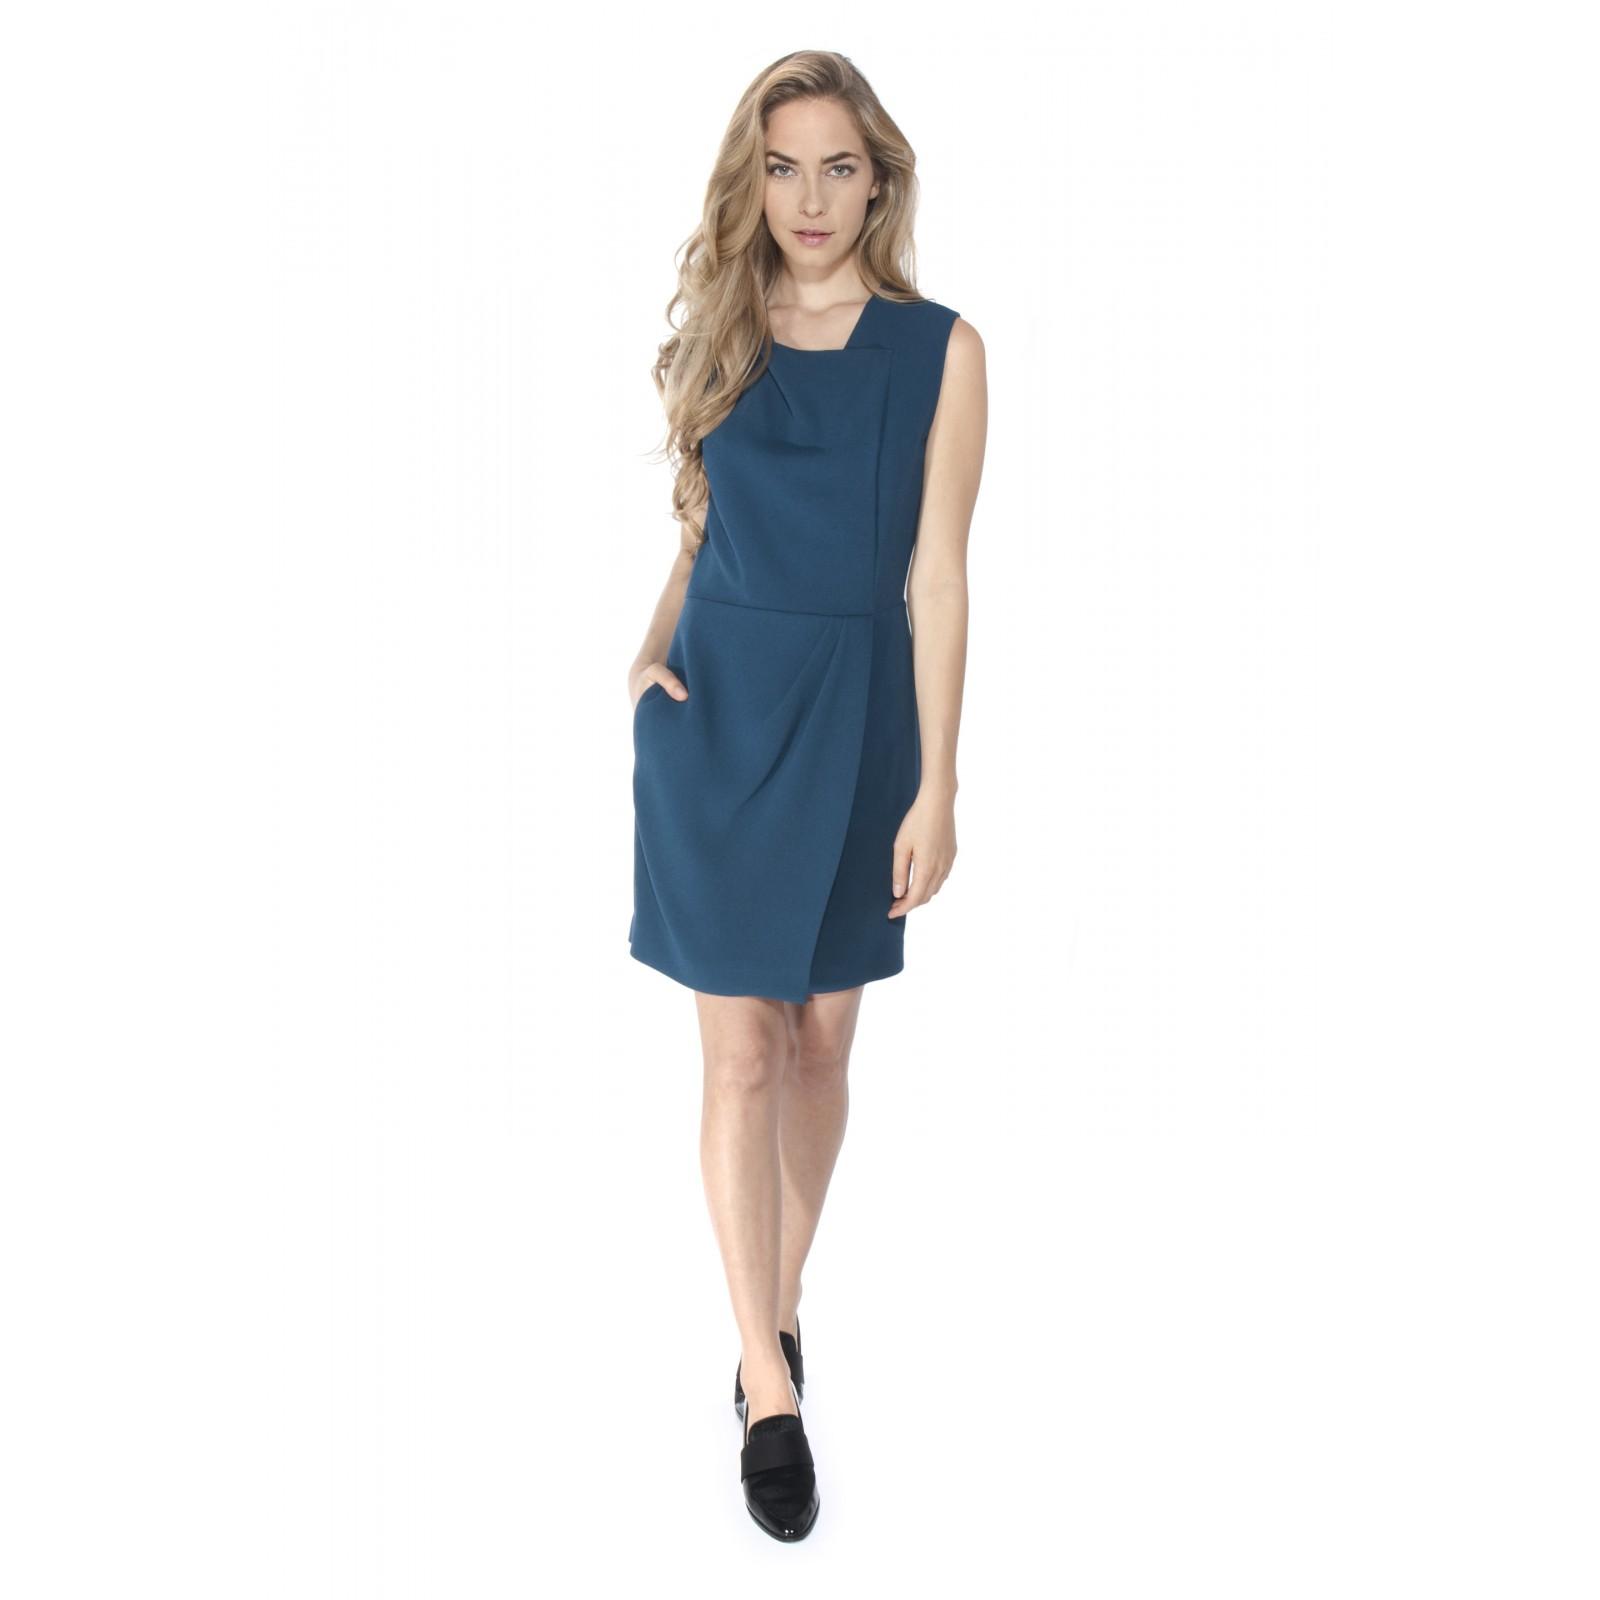 Asymmetric Drape Dress: 3.1 Phillip Lim Asymmetric Draped Dress In Blue (peacock